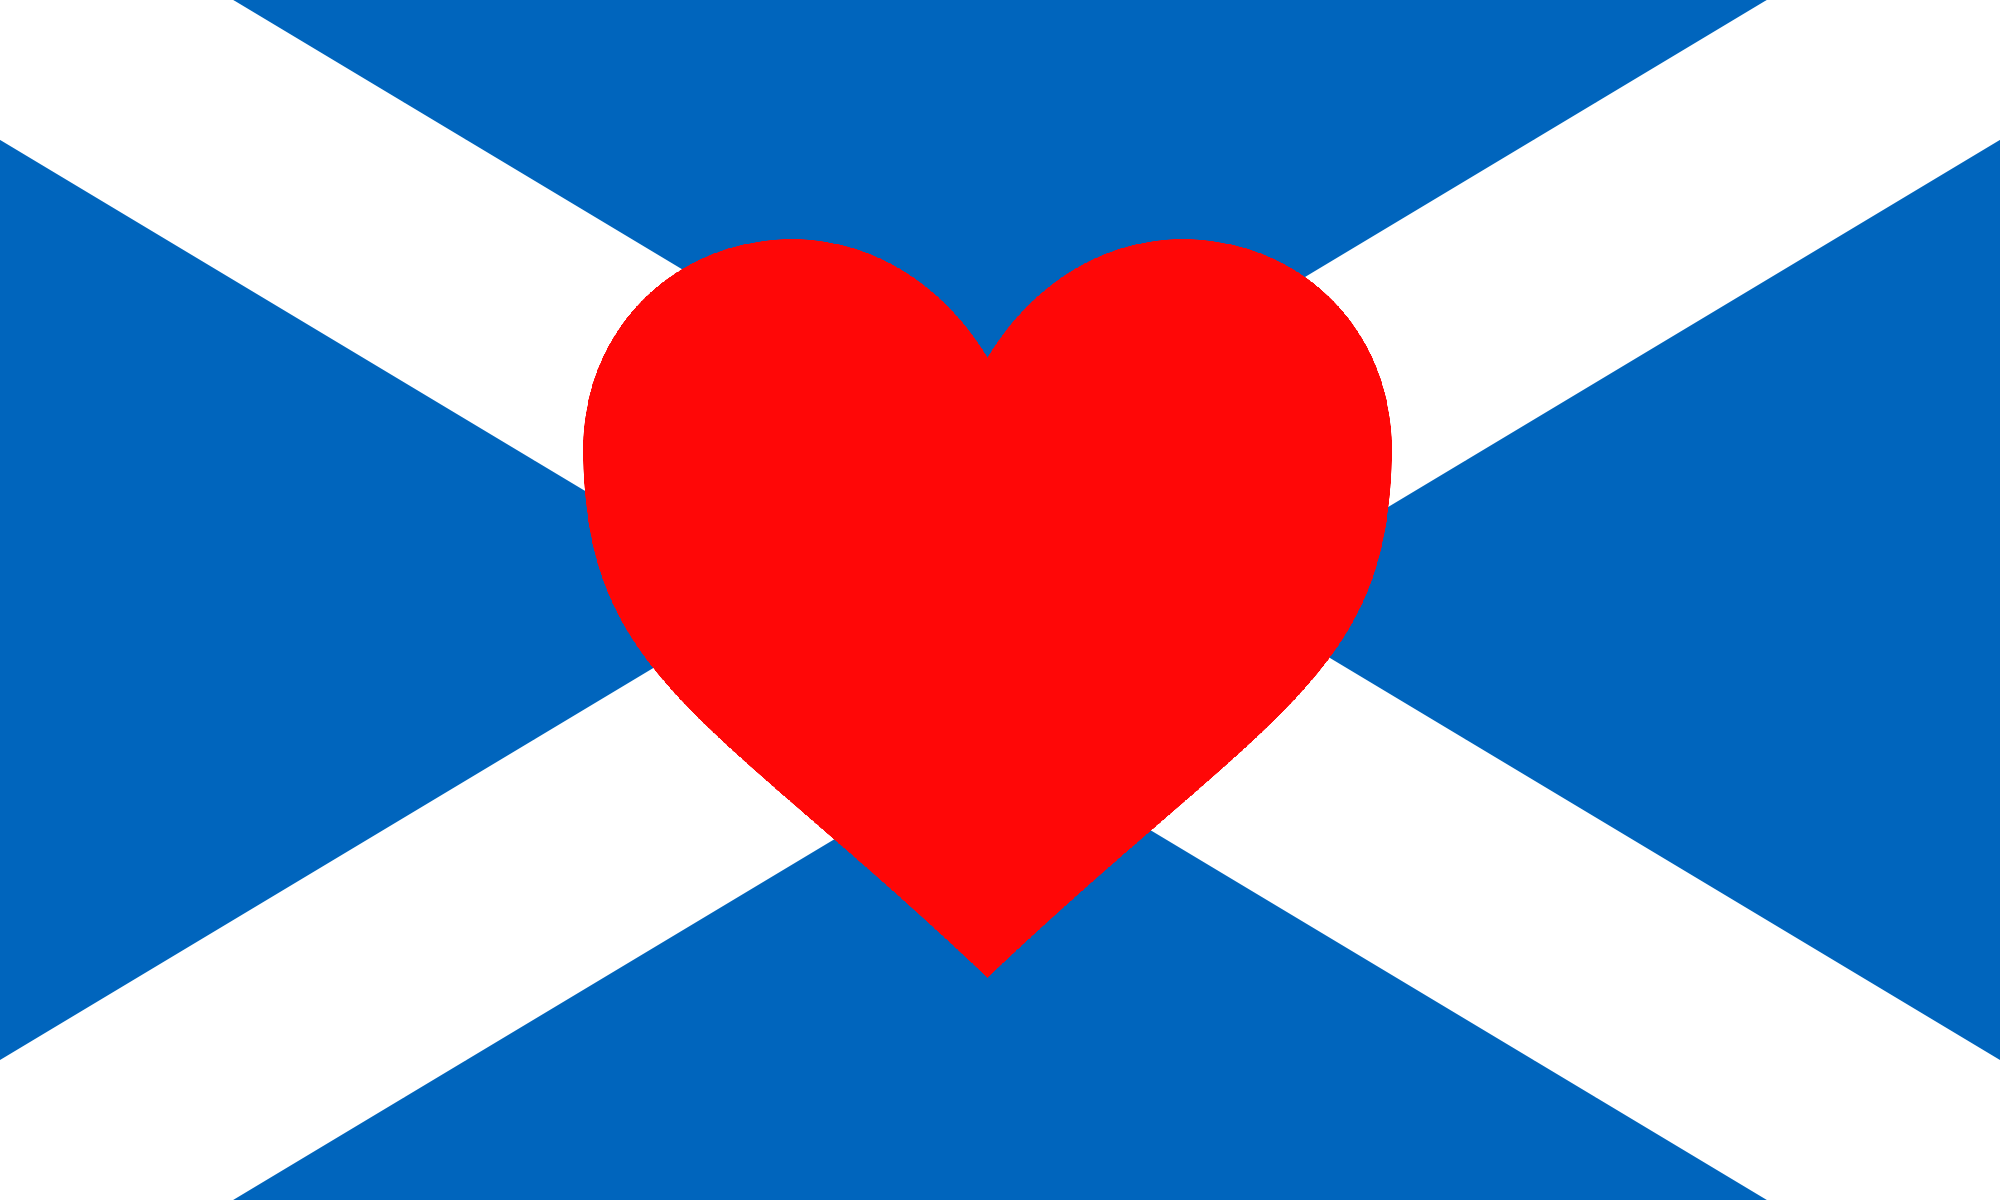 scottish flag and heart